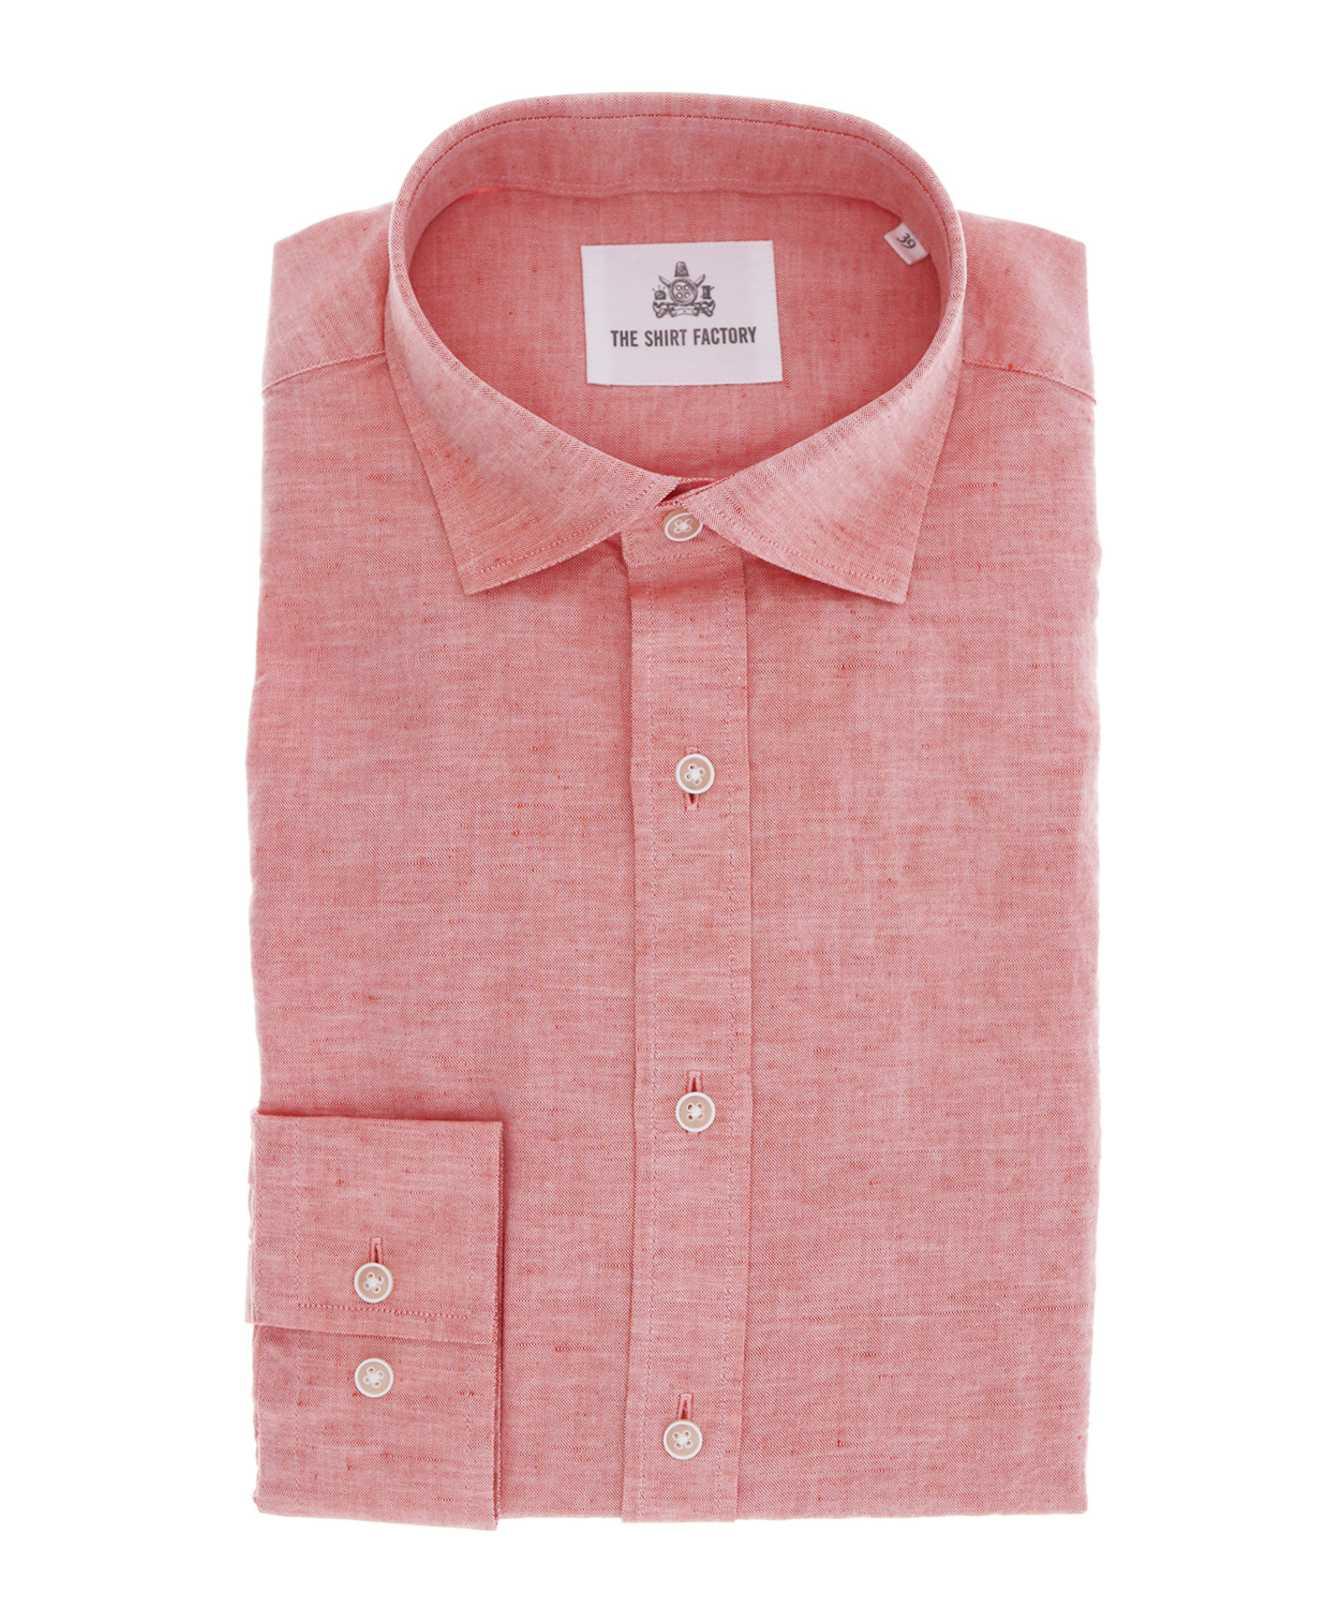 Skjorta Portofino Linne Orange The Shirt Factory